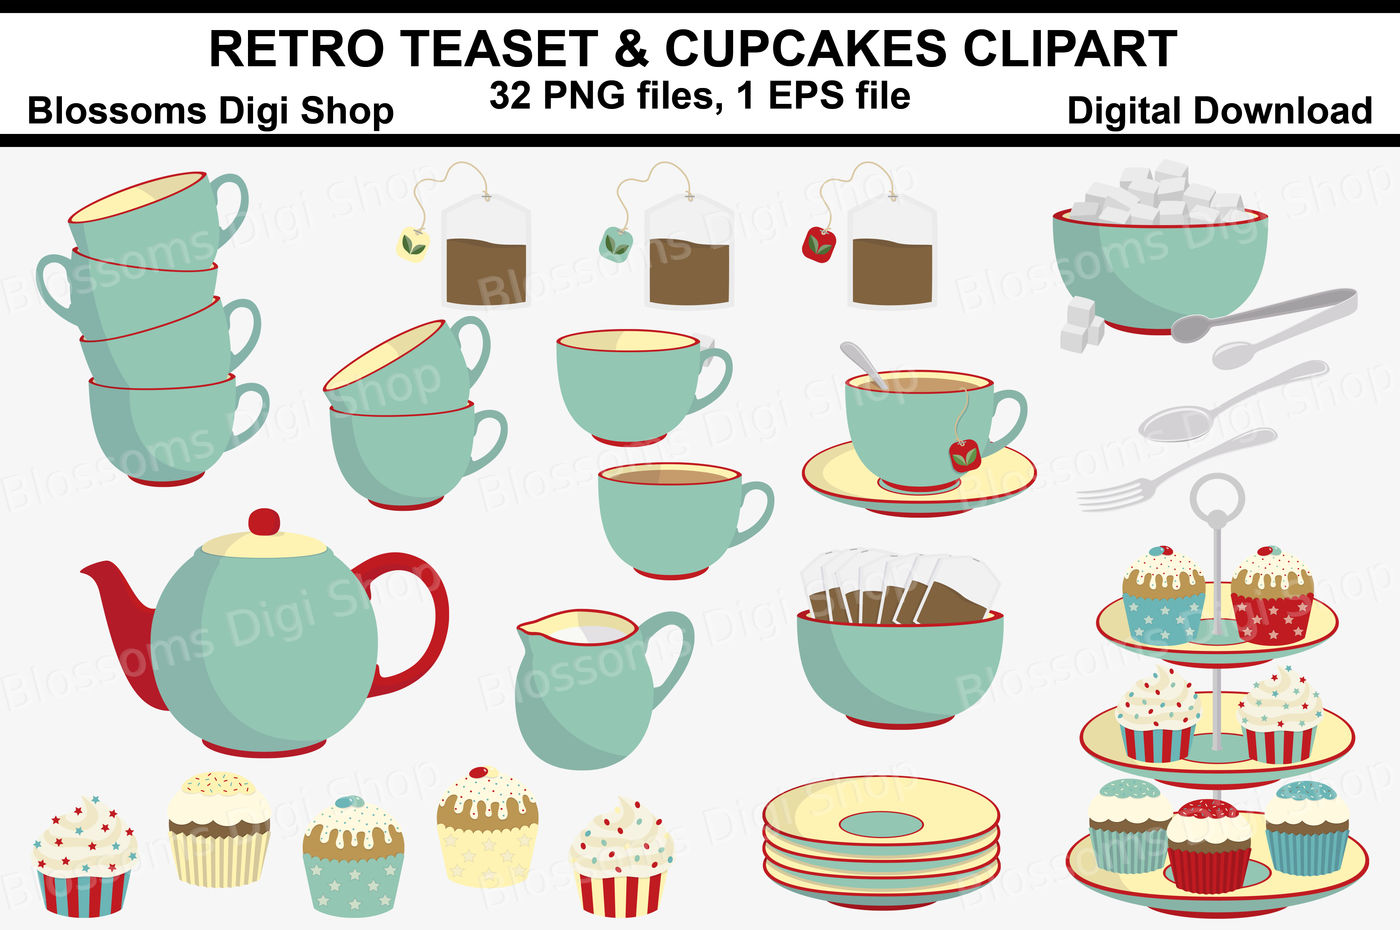 Cupcake Vintage stock vector. Illustration of backgrounds - 33653307